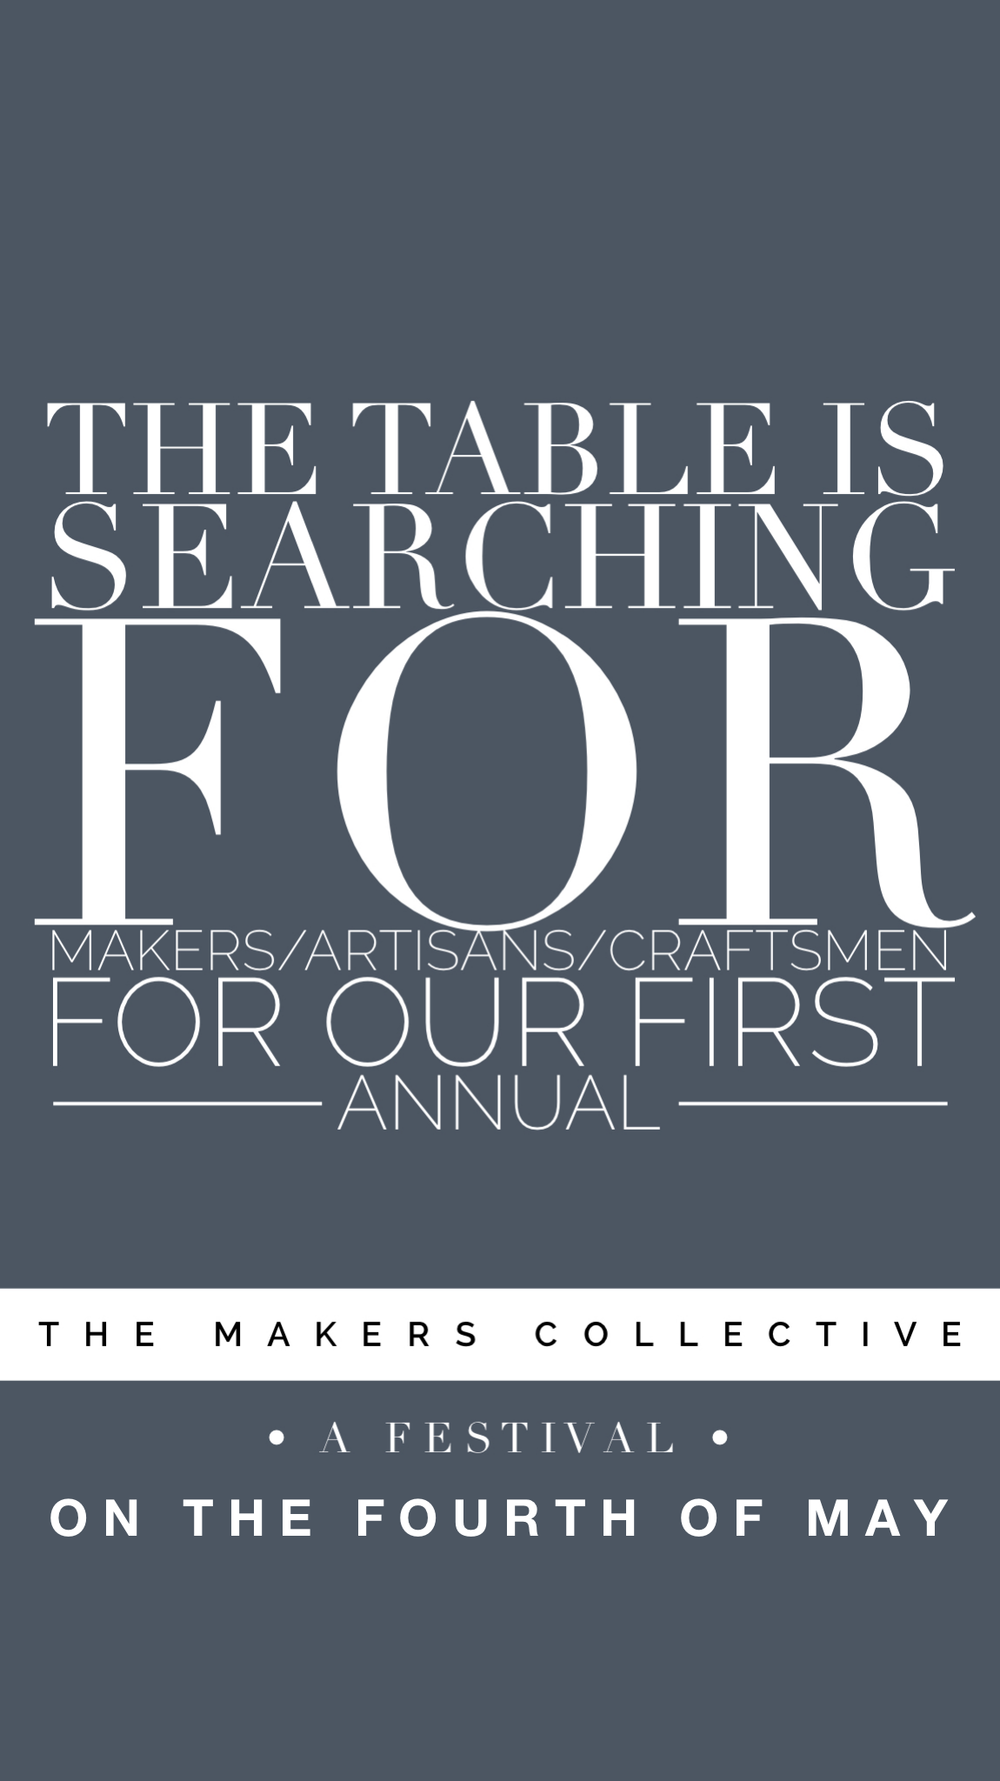 Maker Event.png